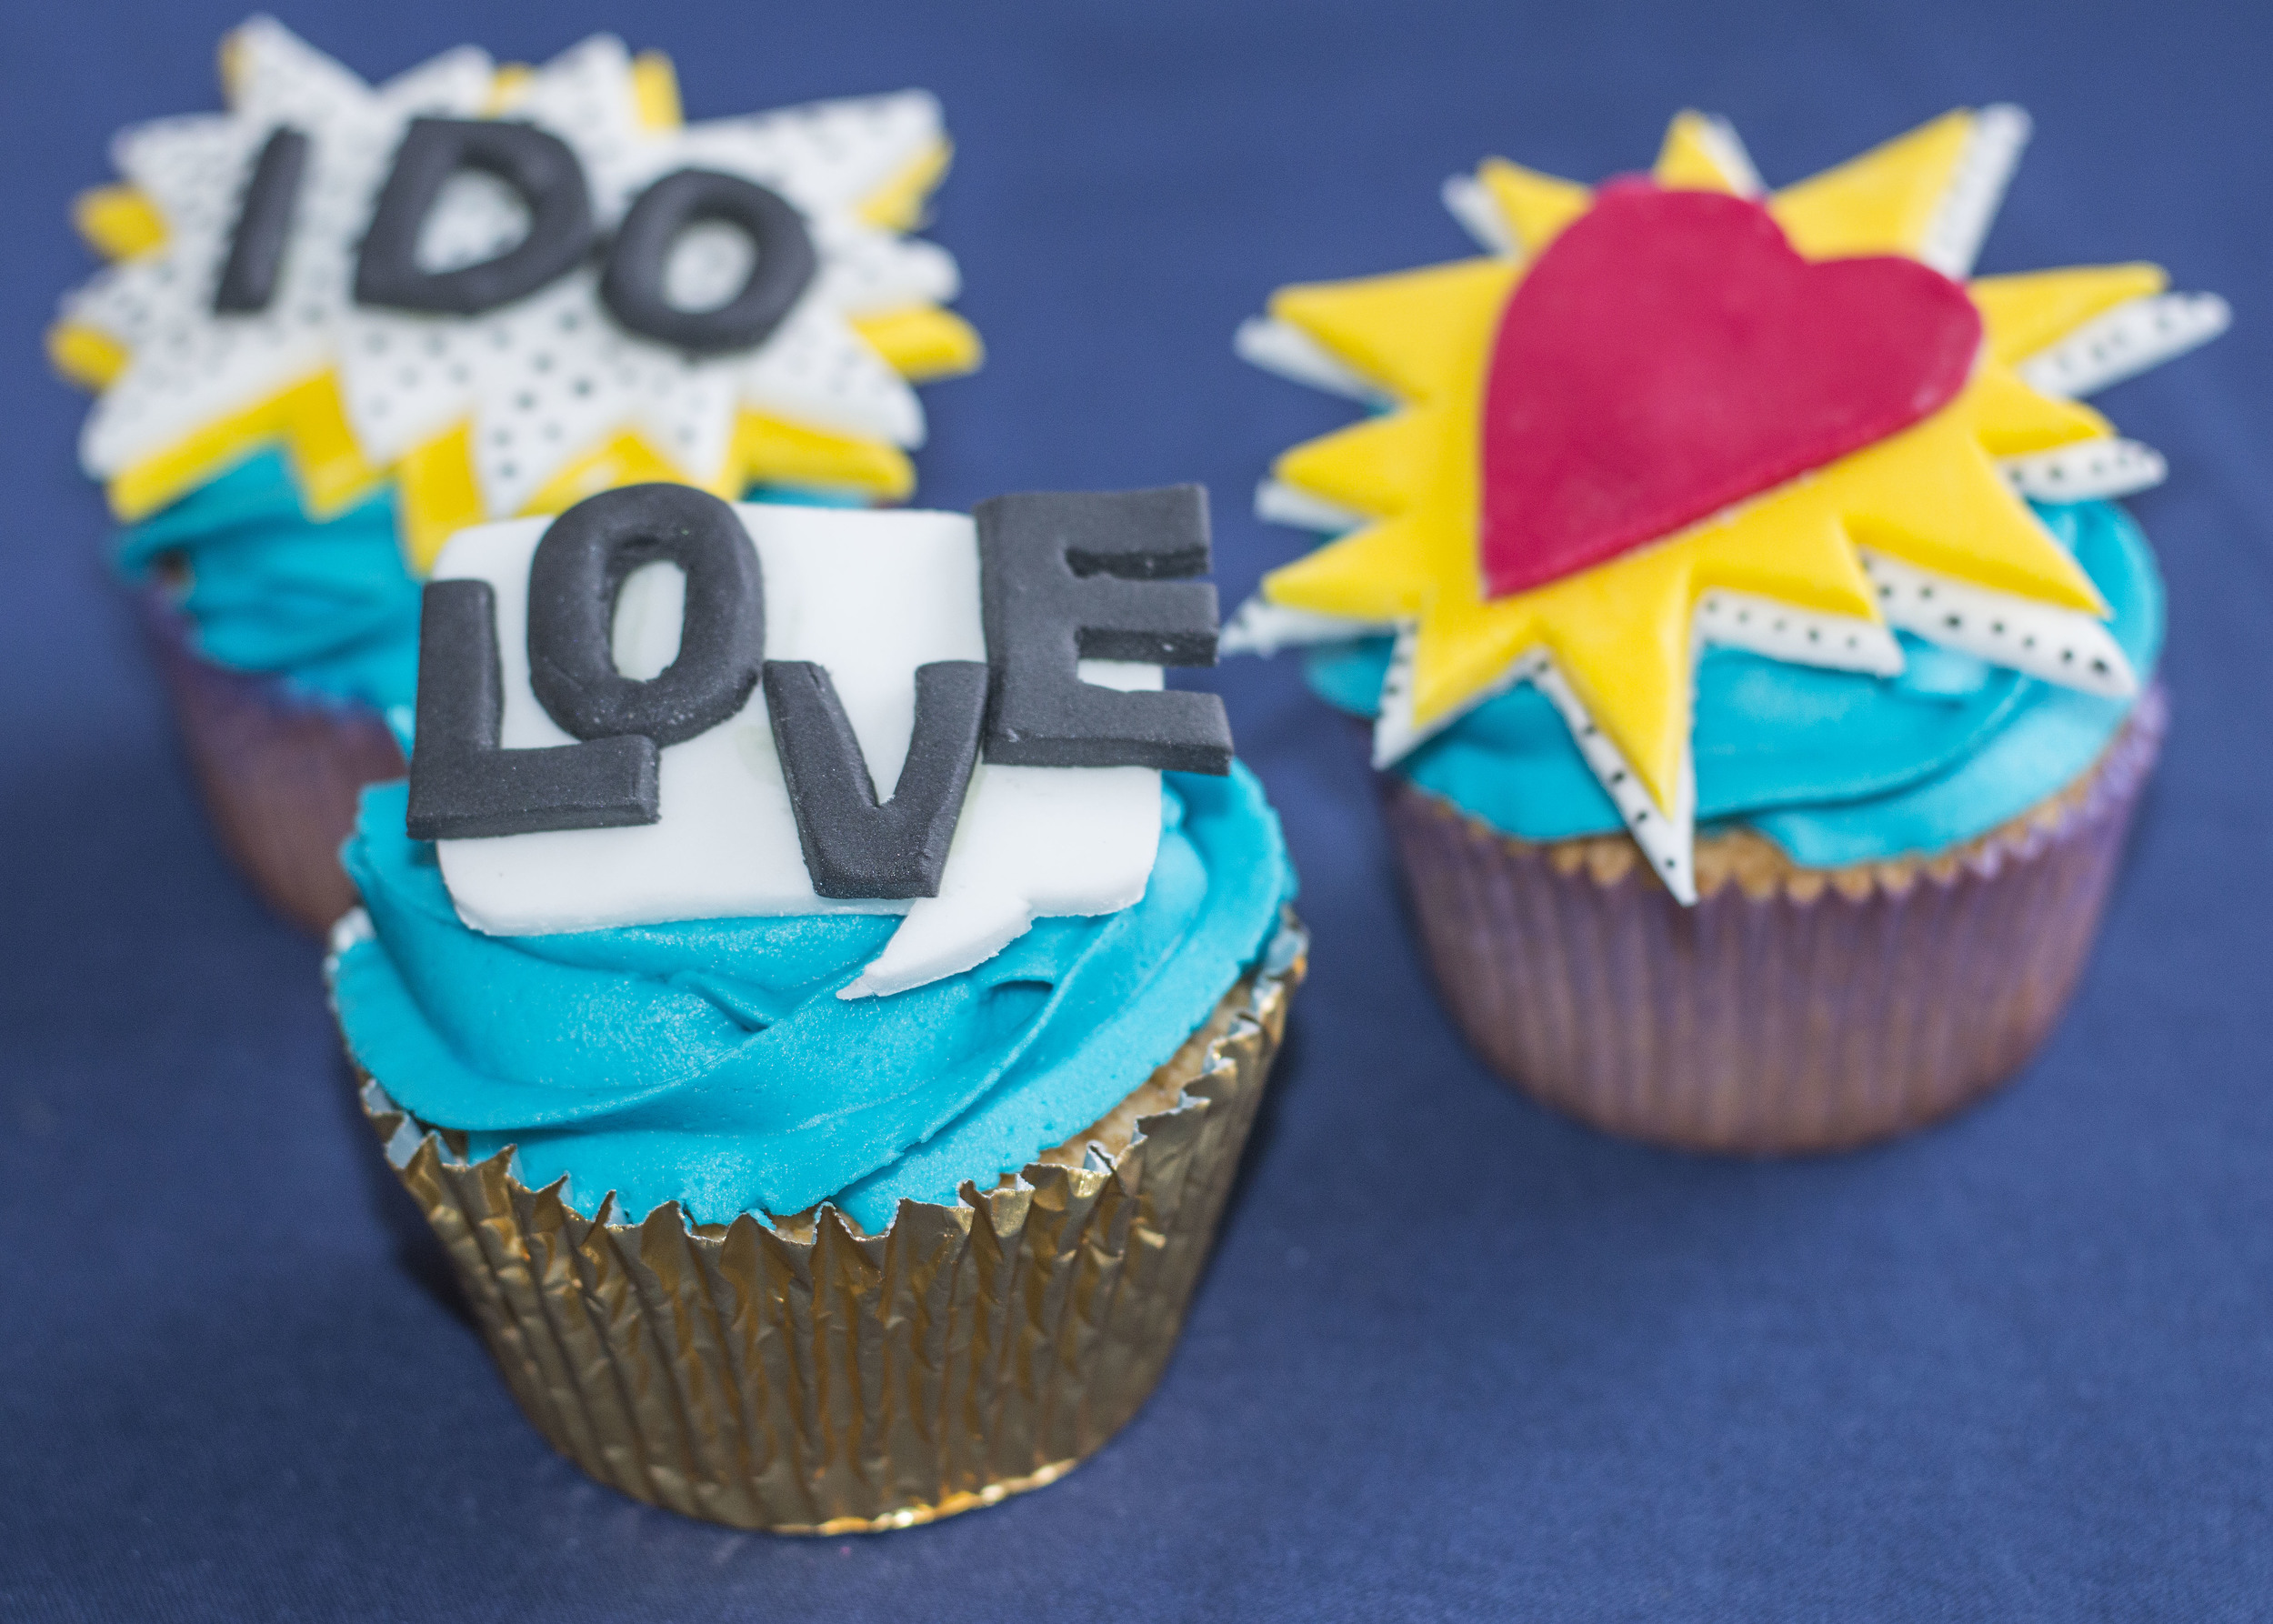 Pop Art/cartoon cupcakes